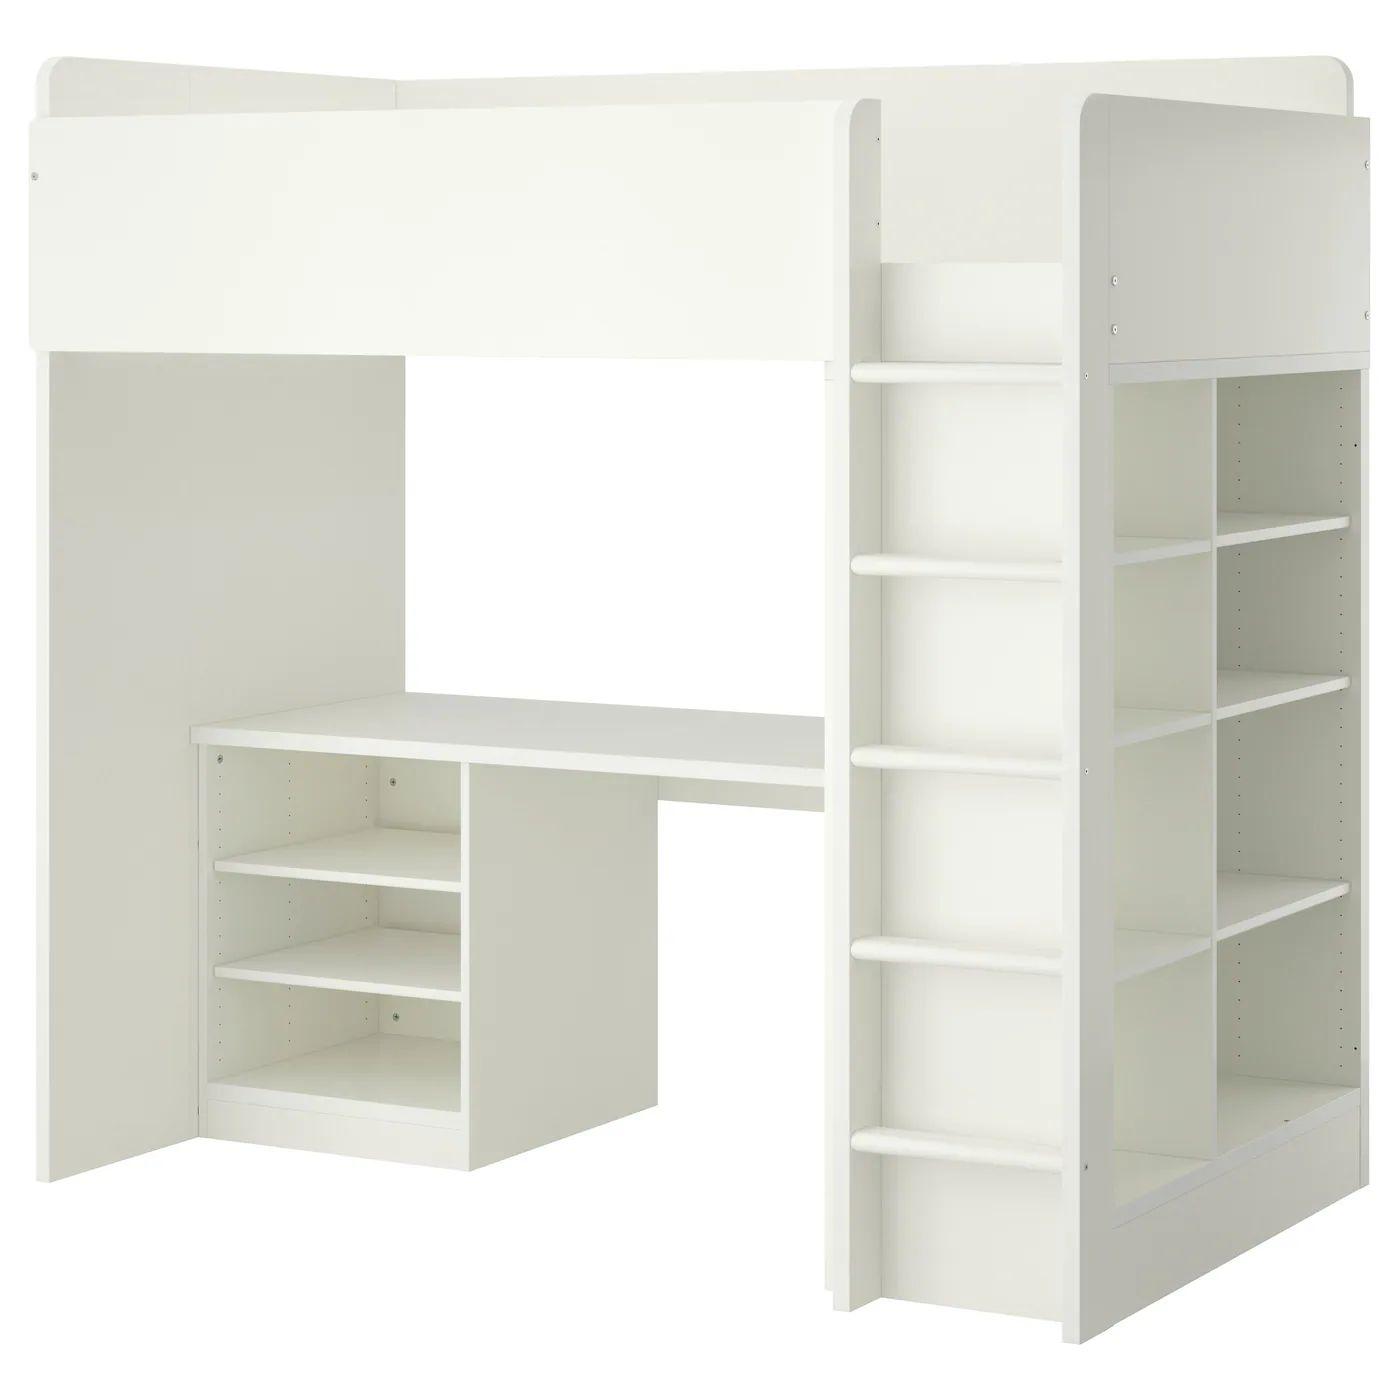 Ikea stuva loft bed combo w 2 shlvs 3 shlvs